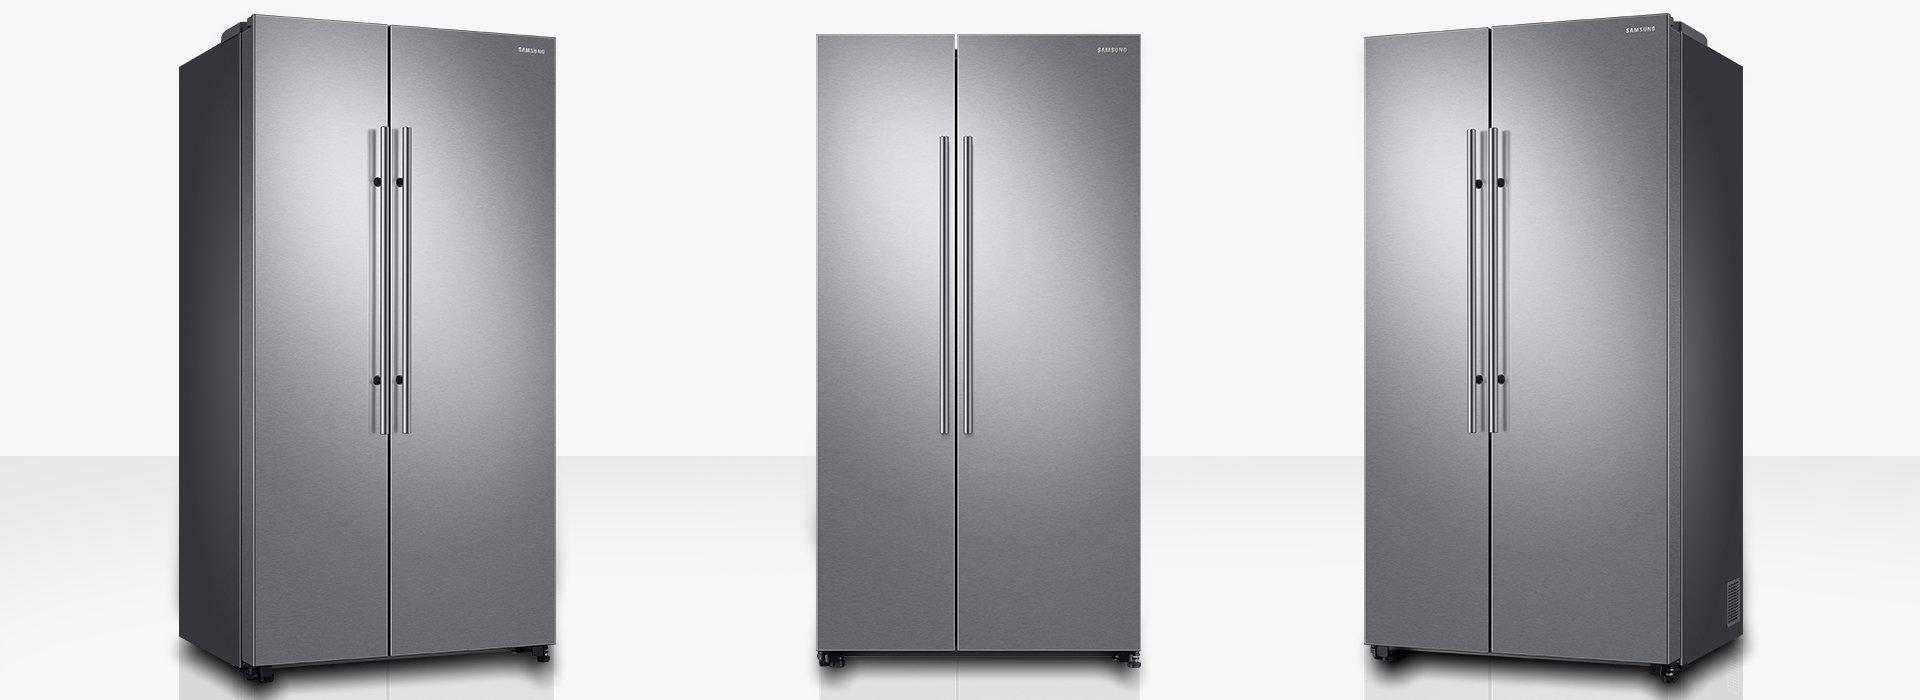 Samsung Chladničky Rs66n8100s9 Design